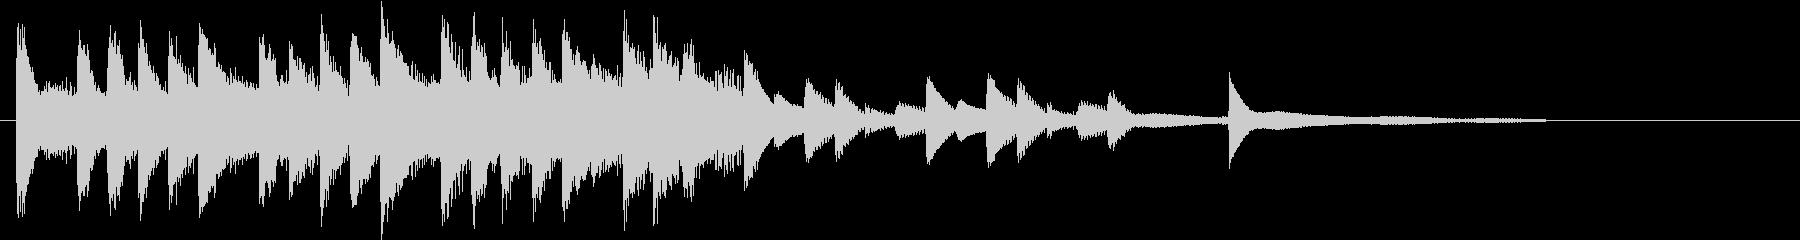 XmasキャロルオブザベルズジングルFの未再生の波形